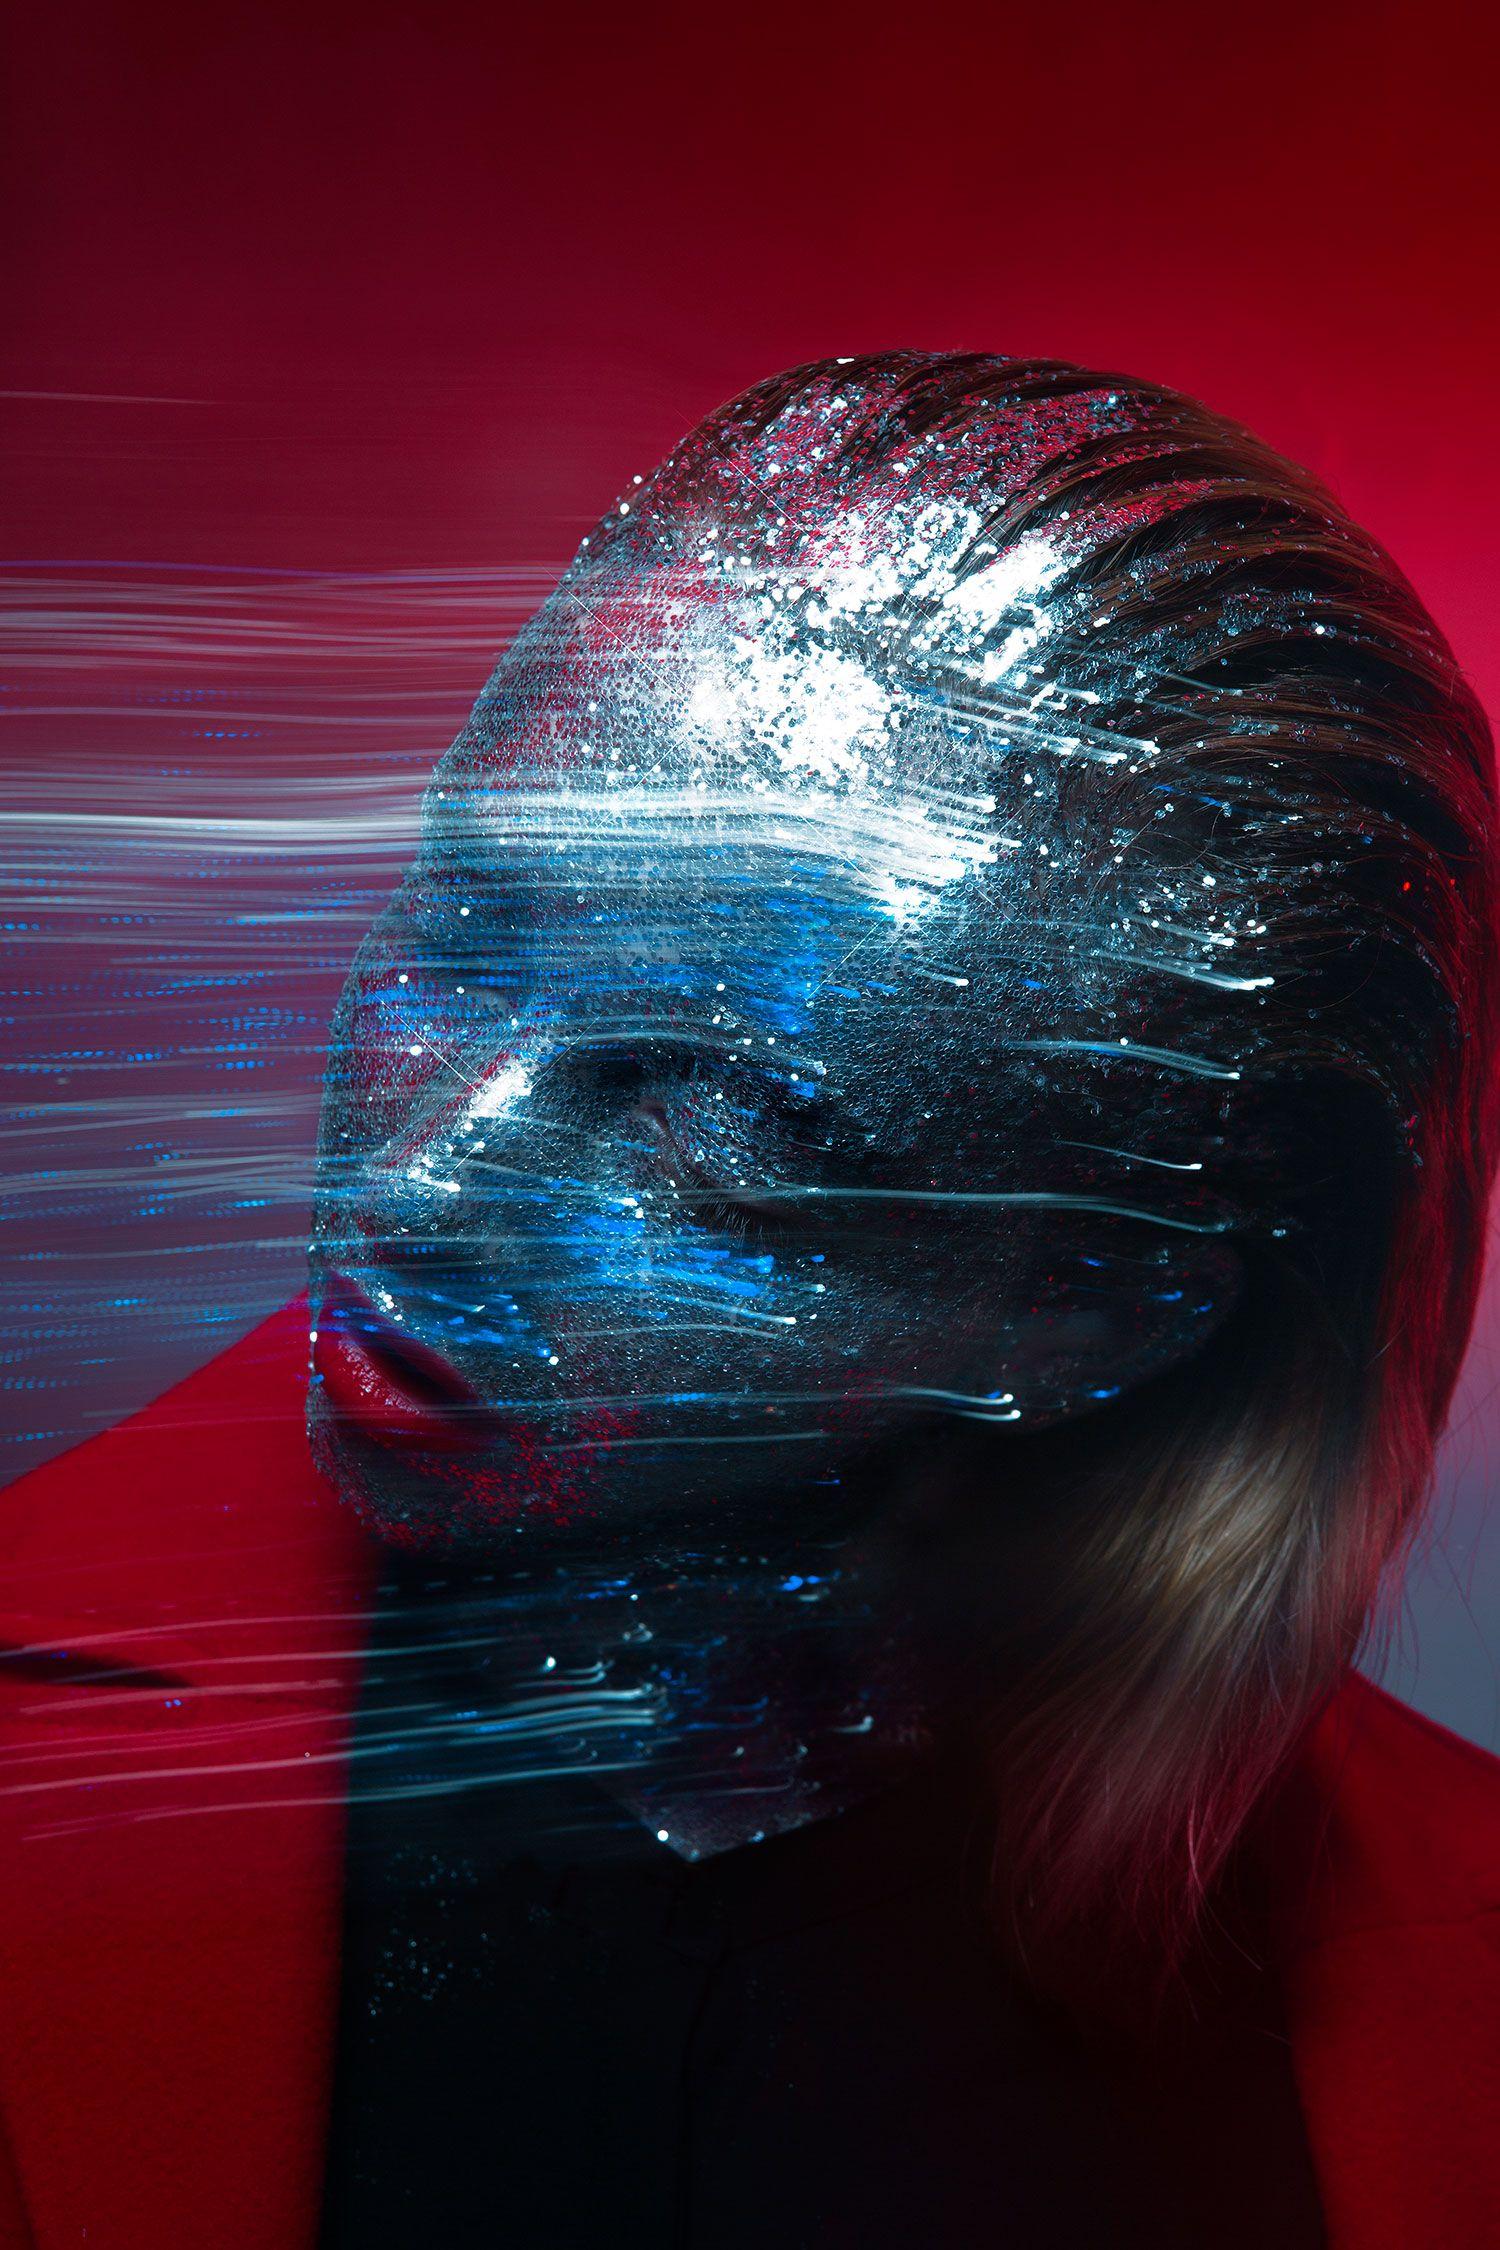 Long Exposure Portraiture and Color Gels - BorrowLenses Blog